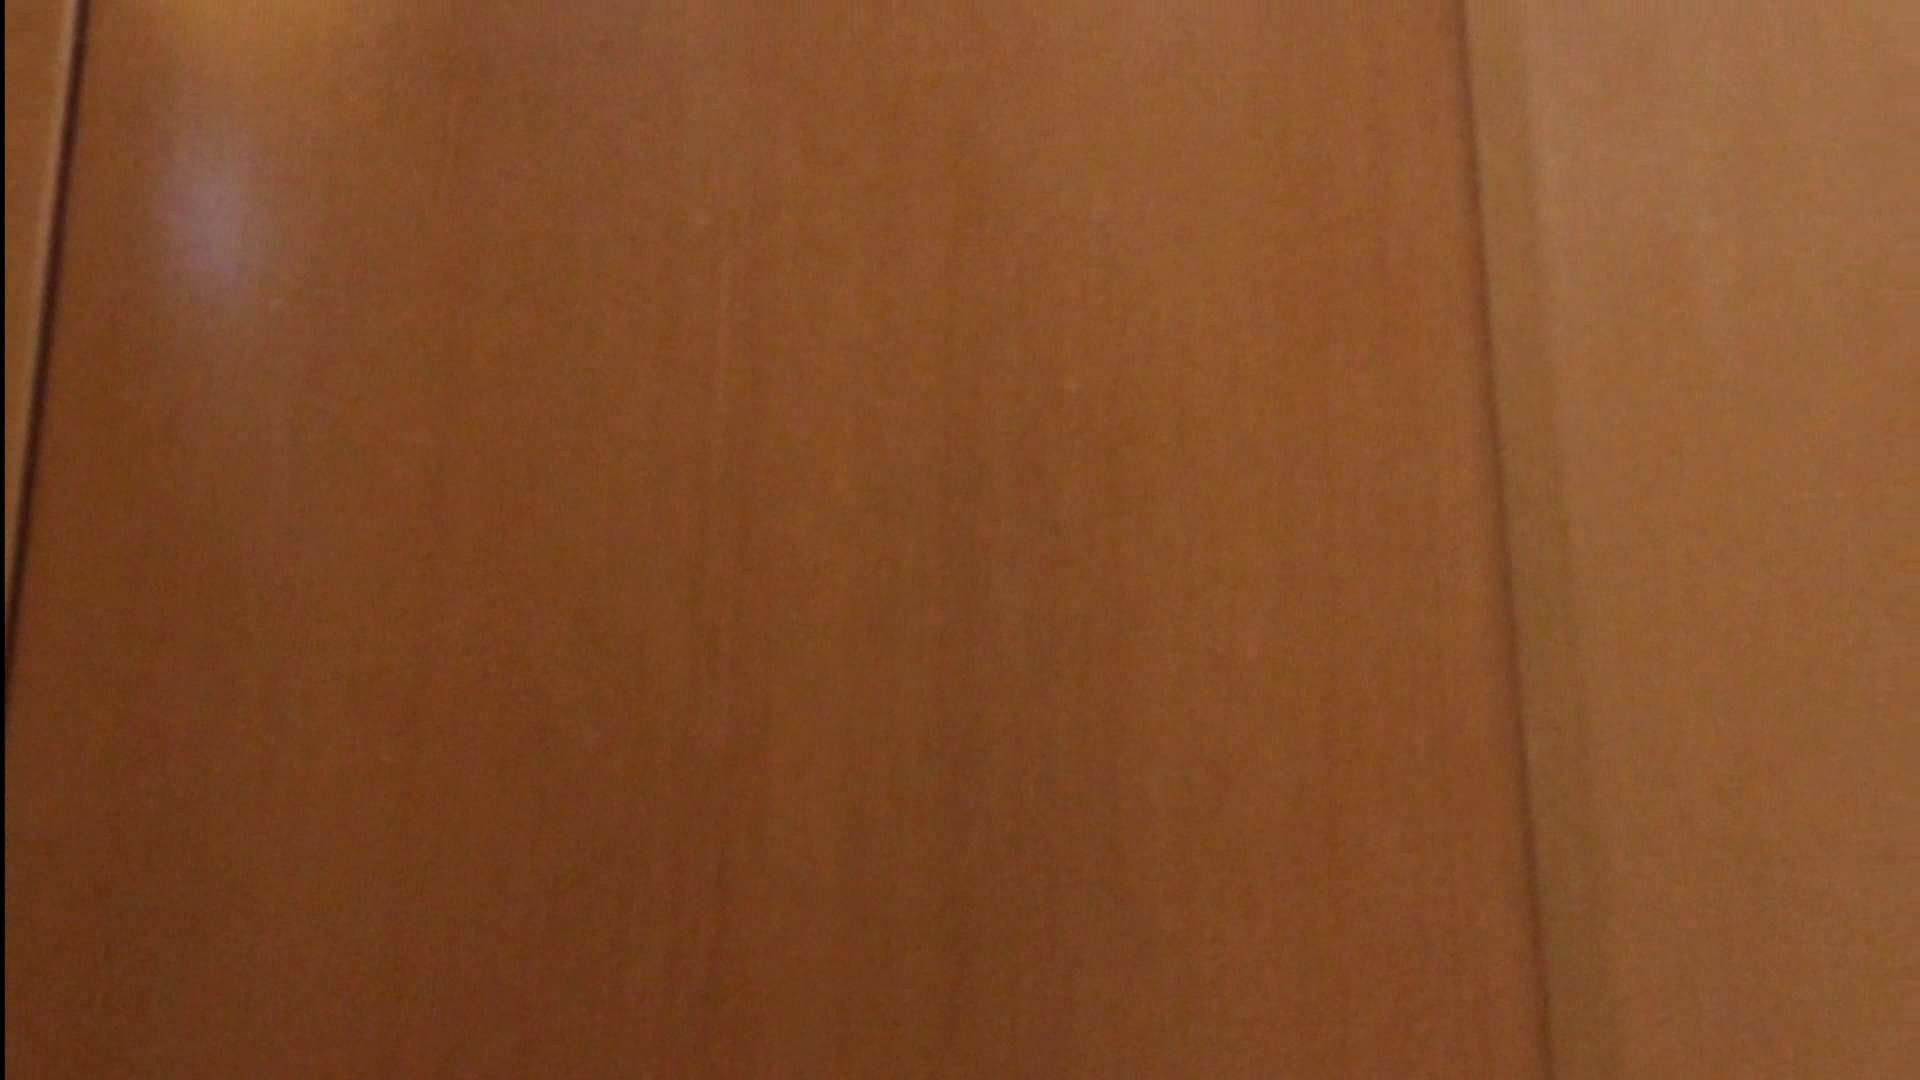 「噂」の国の厠観察日記2 Vol.04 厠  70Pix 17